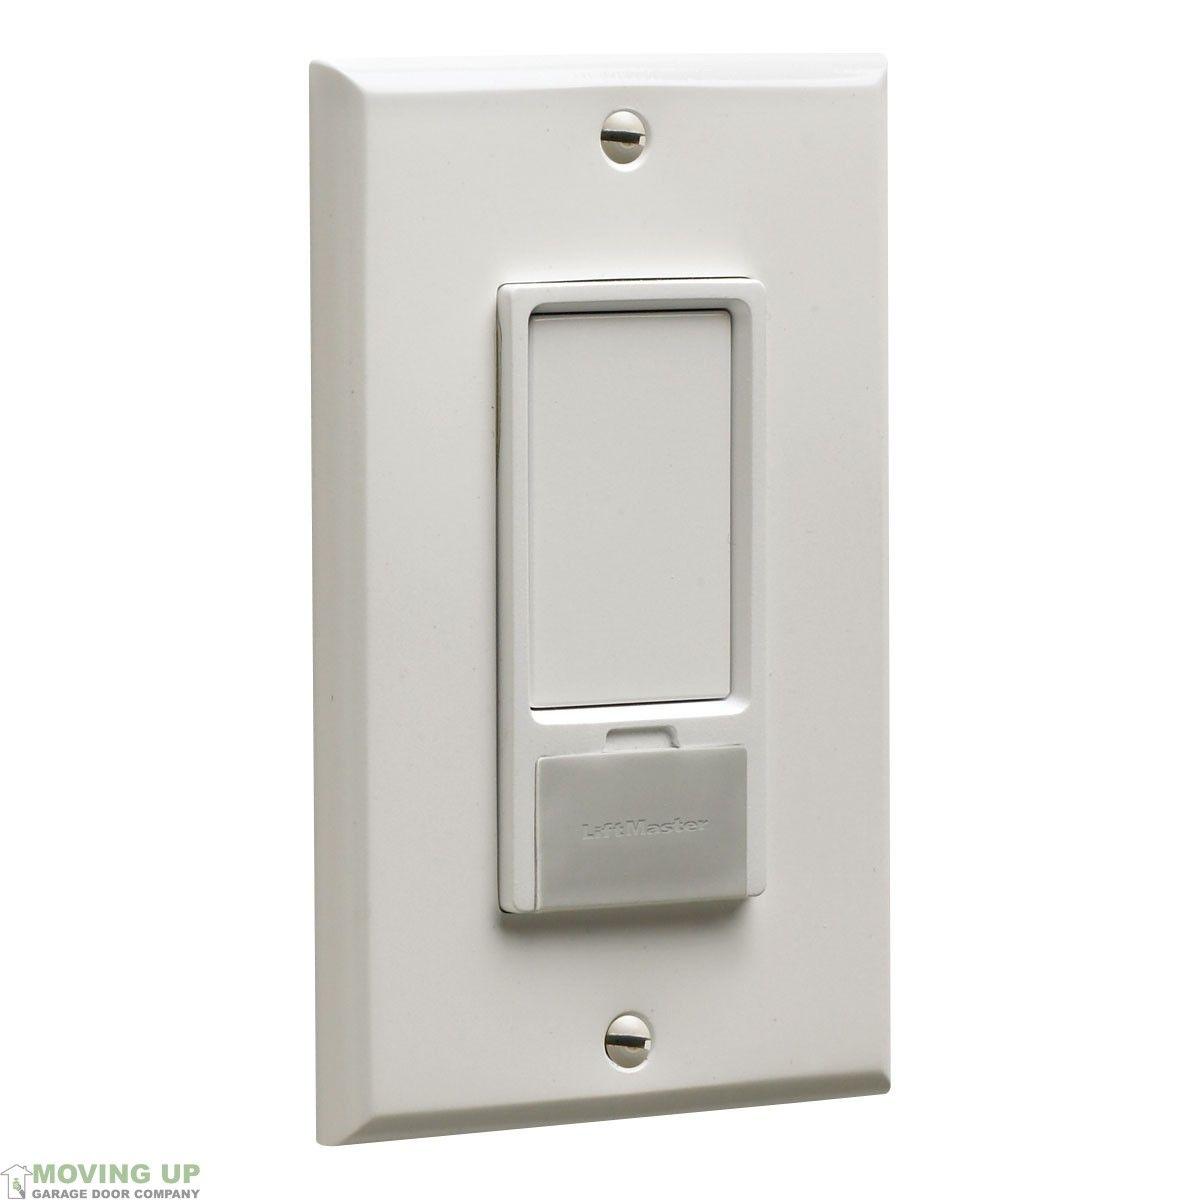 Liftmaster 823lm Myq Remote Light Switch Remote Light Switch Light Switch Liftmaster